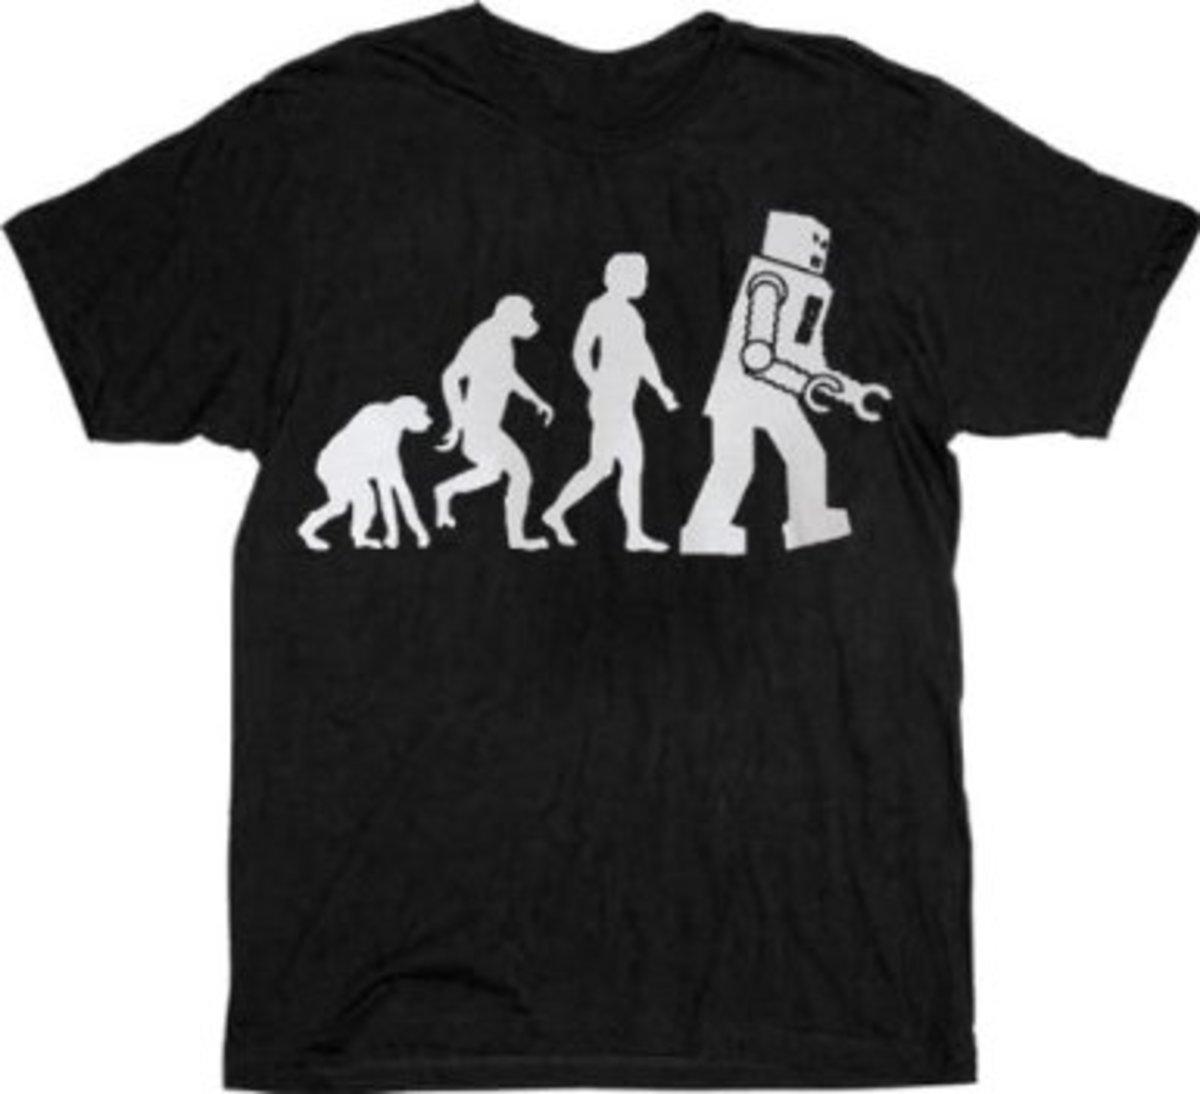 Sheldon Cooper Shirts:  Sheldon Cooper T-Shirts